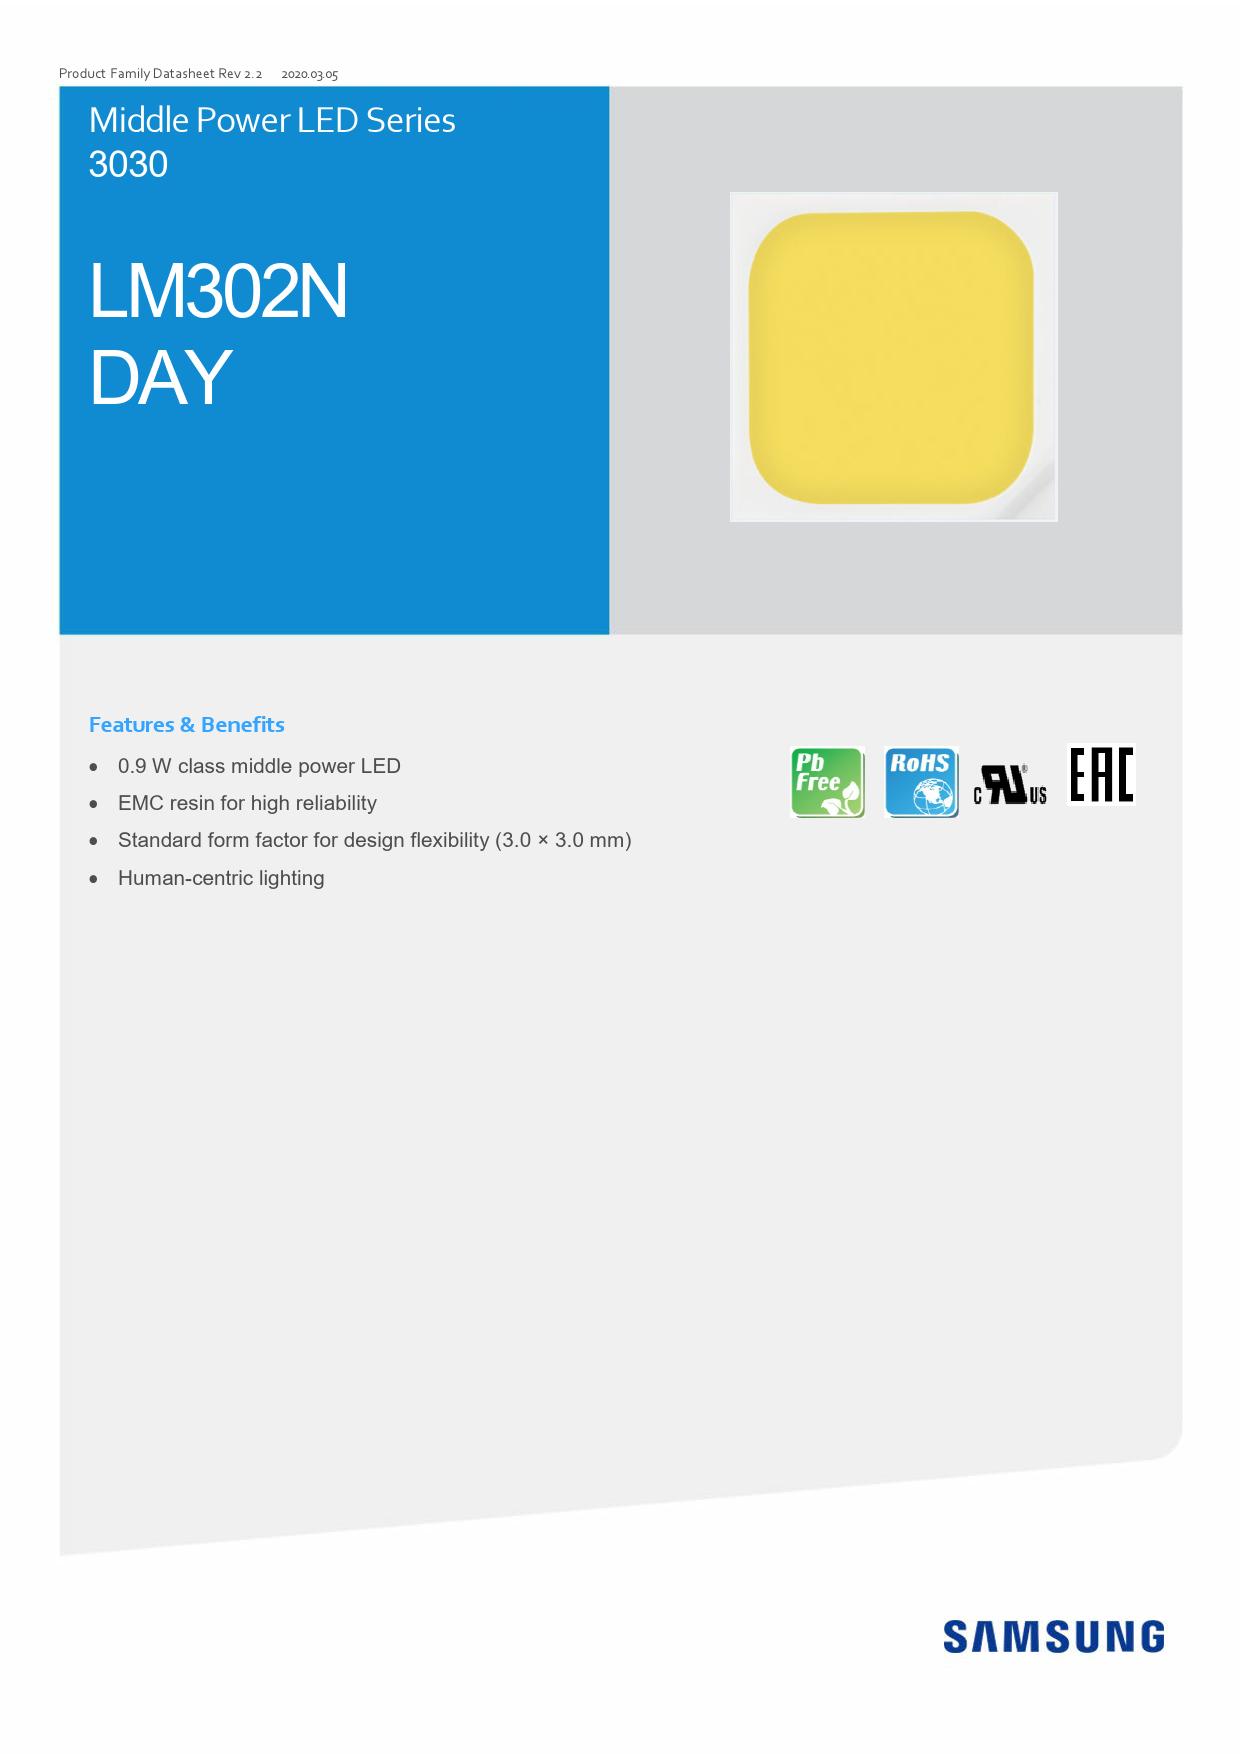 Datasheet LM302N DAY Samsung